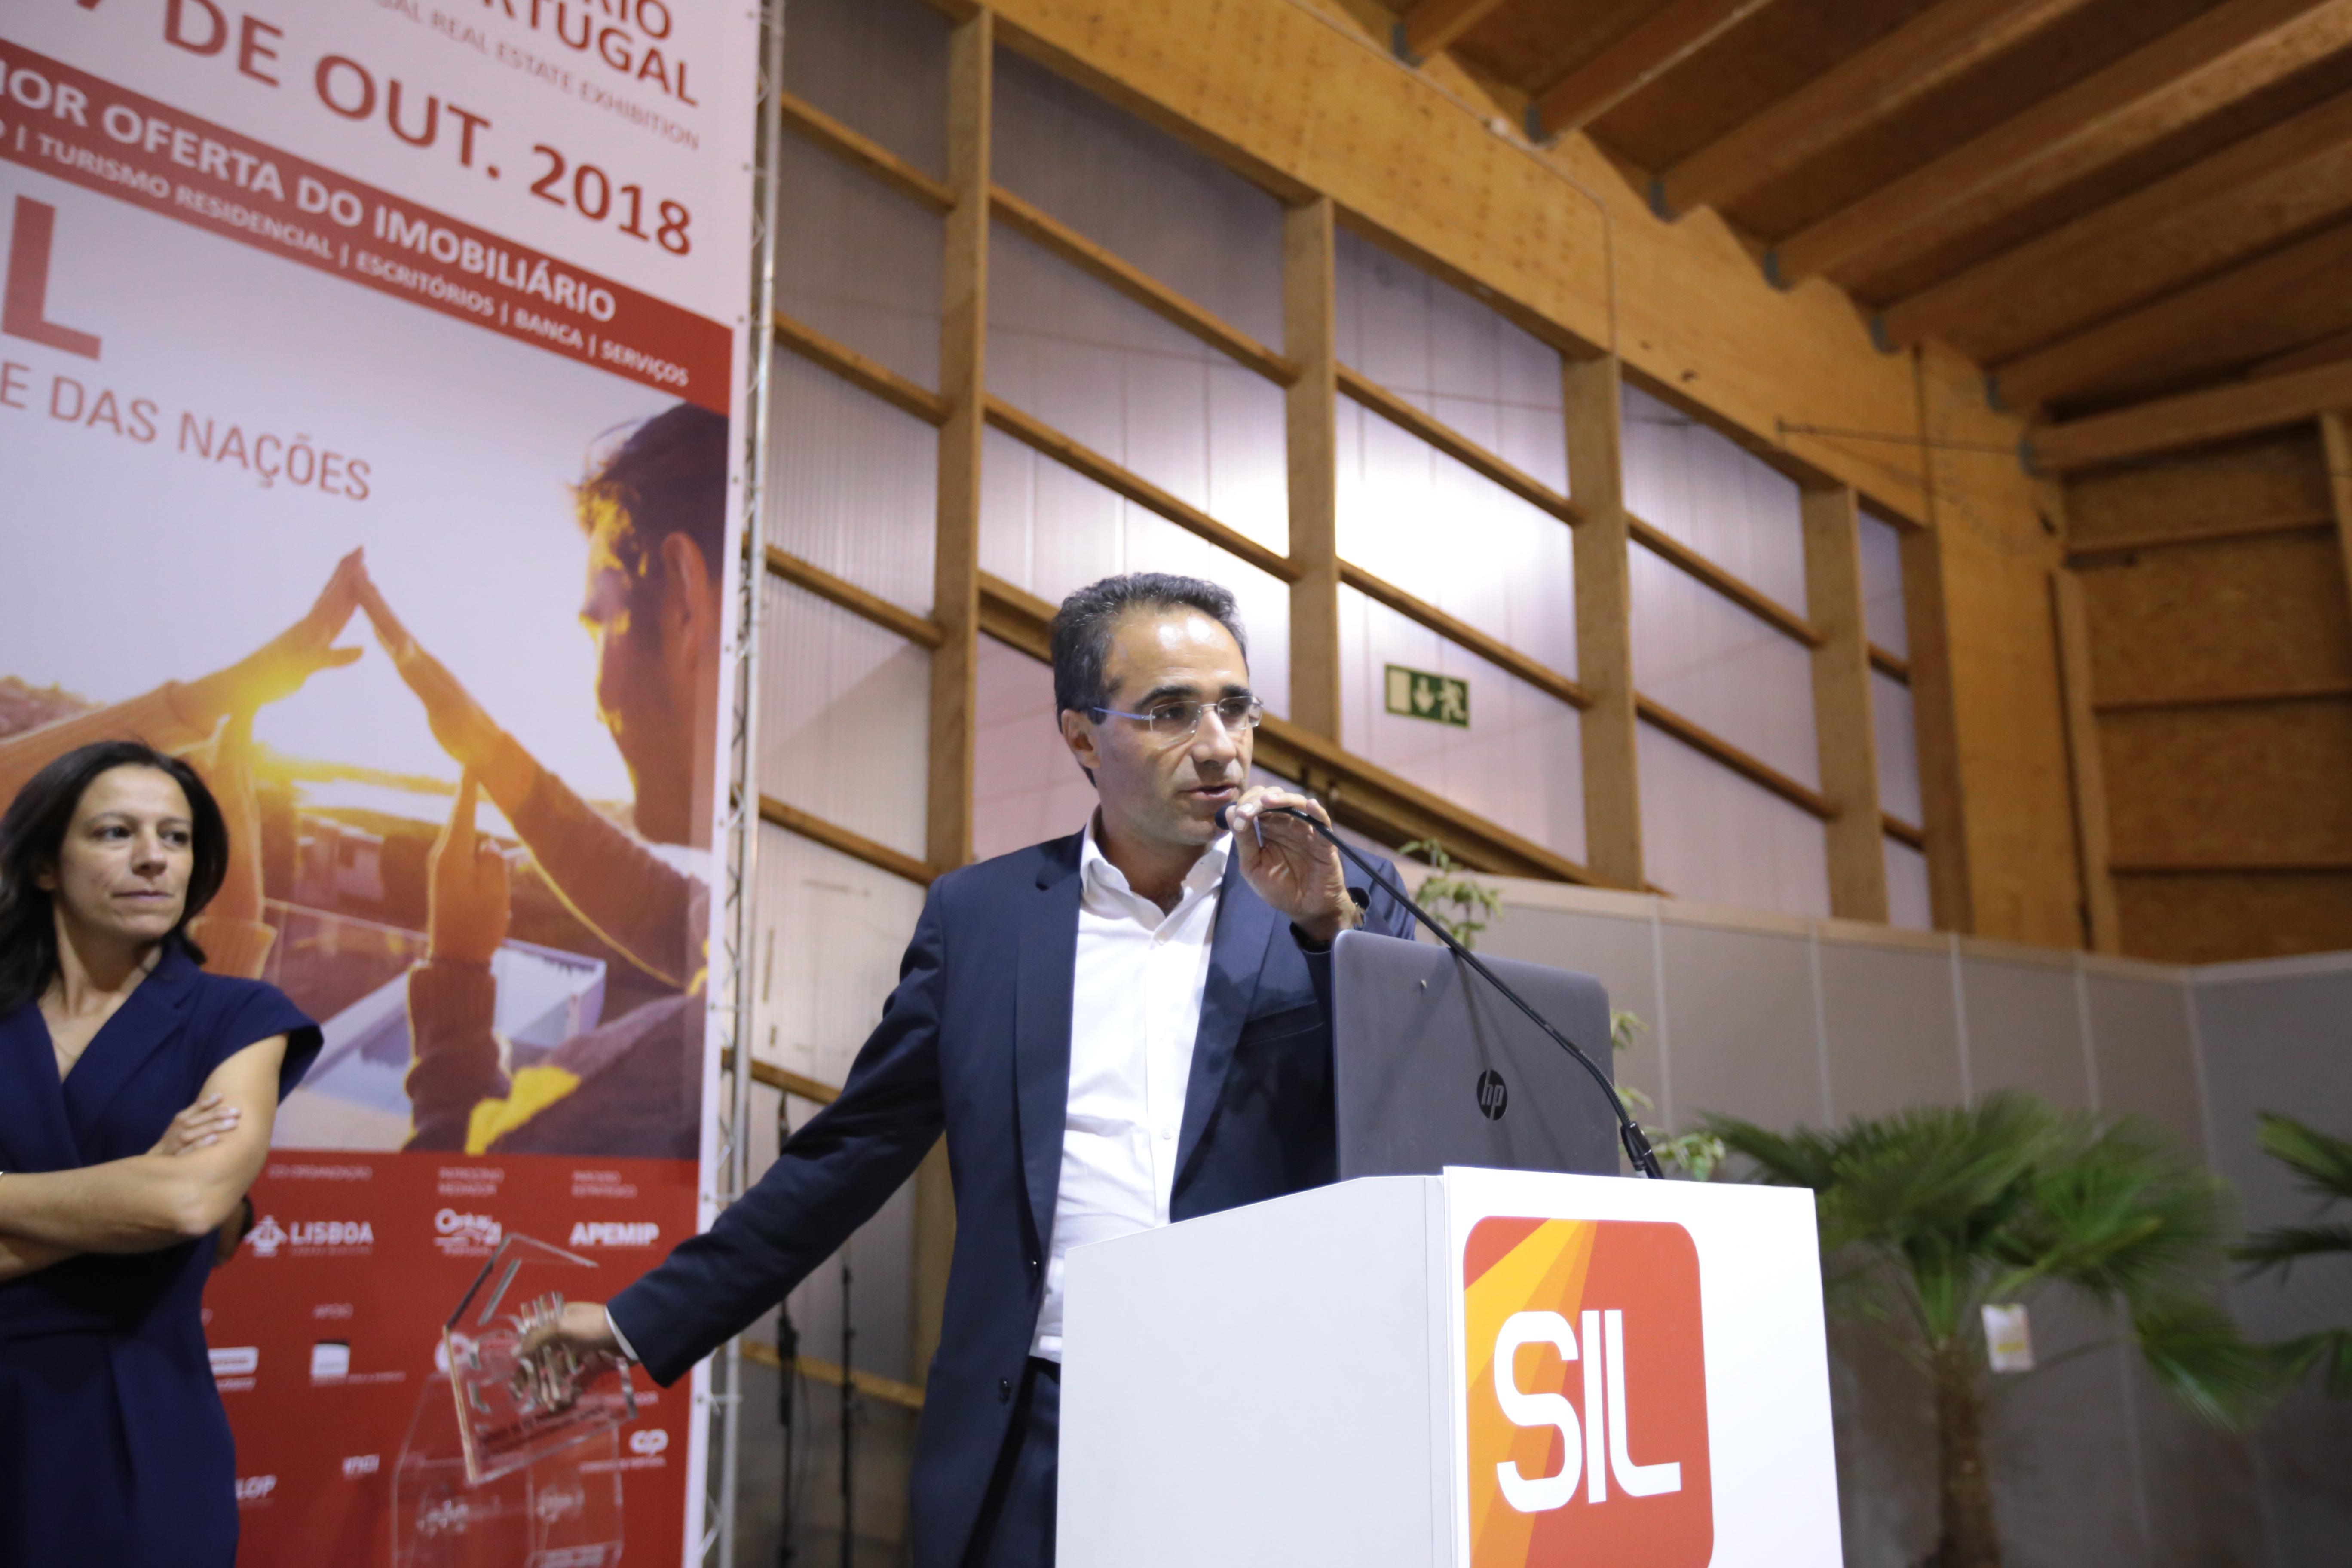 Pascal Gonçalves do Grupo Libertas / Nuno Cruz/FIL